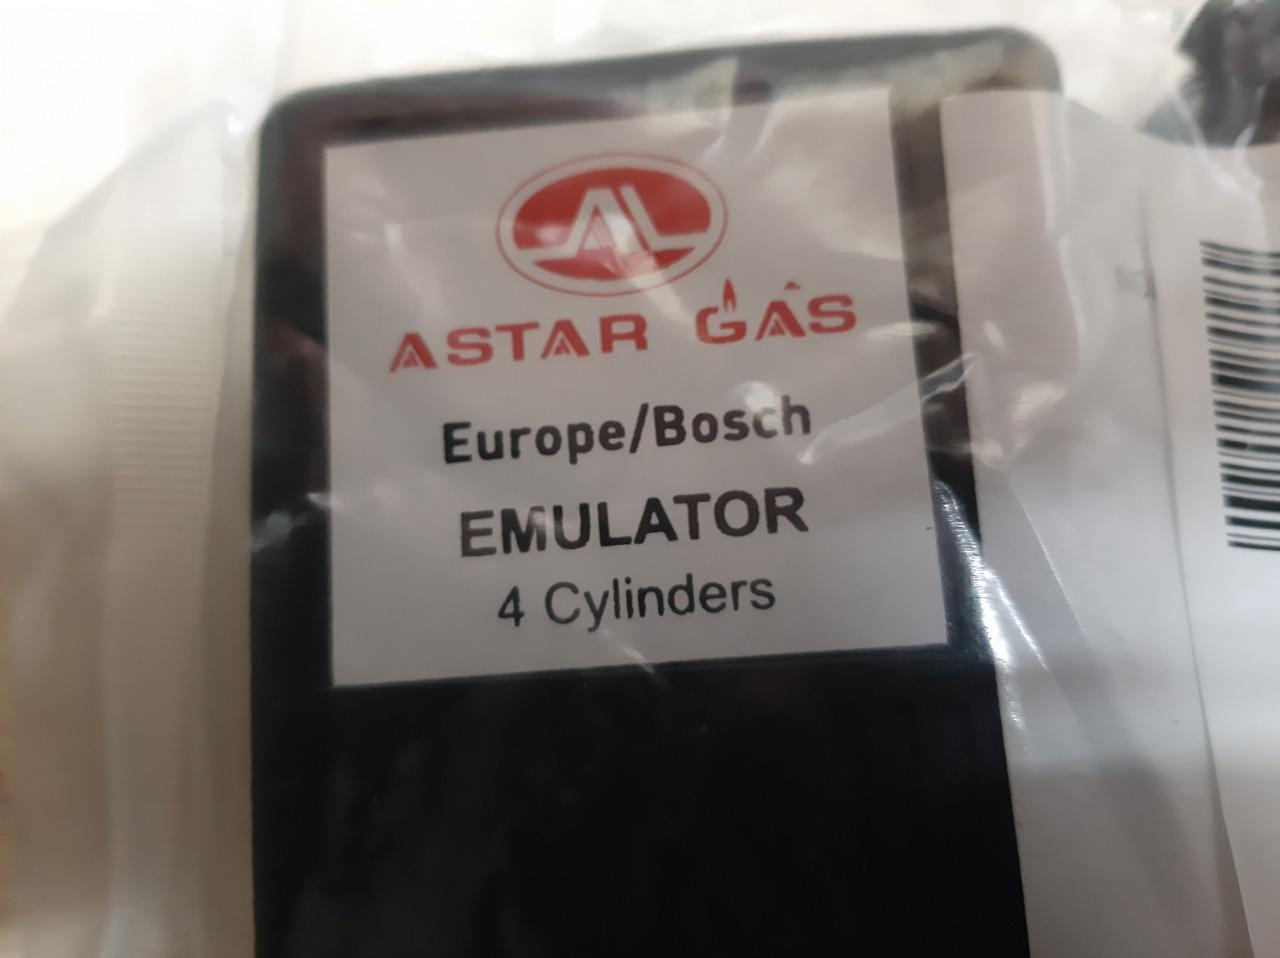 Эмулятор форсунок Astar Gas на 4 цил с фишками Bosch